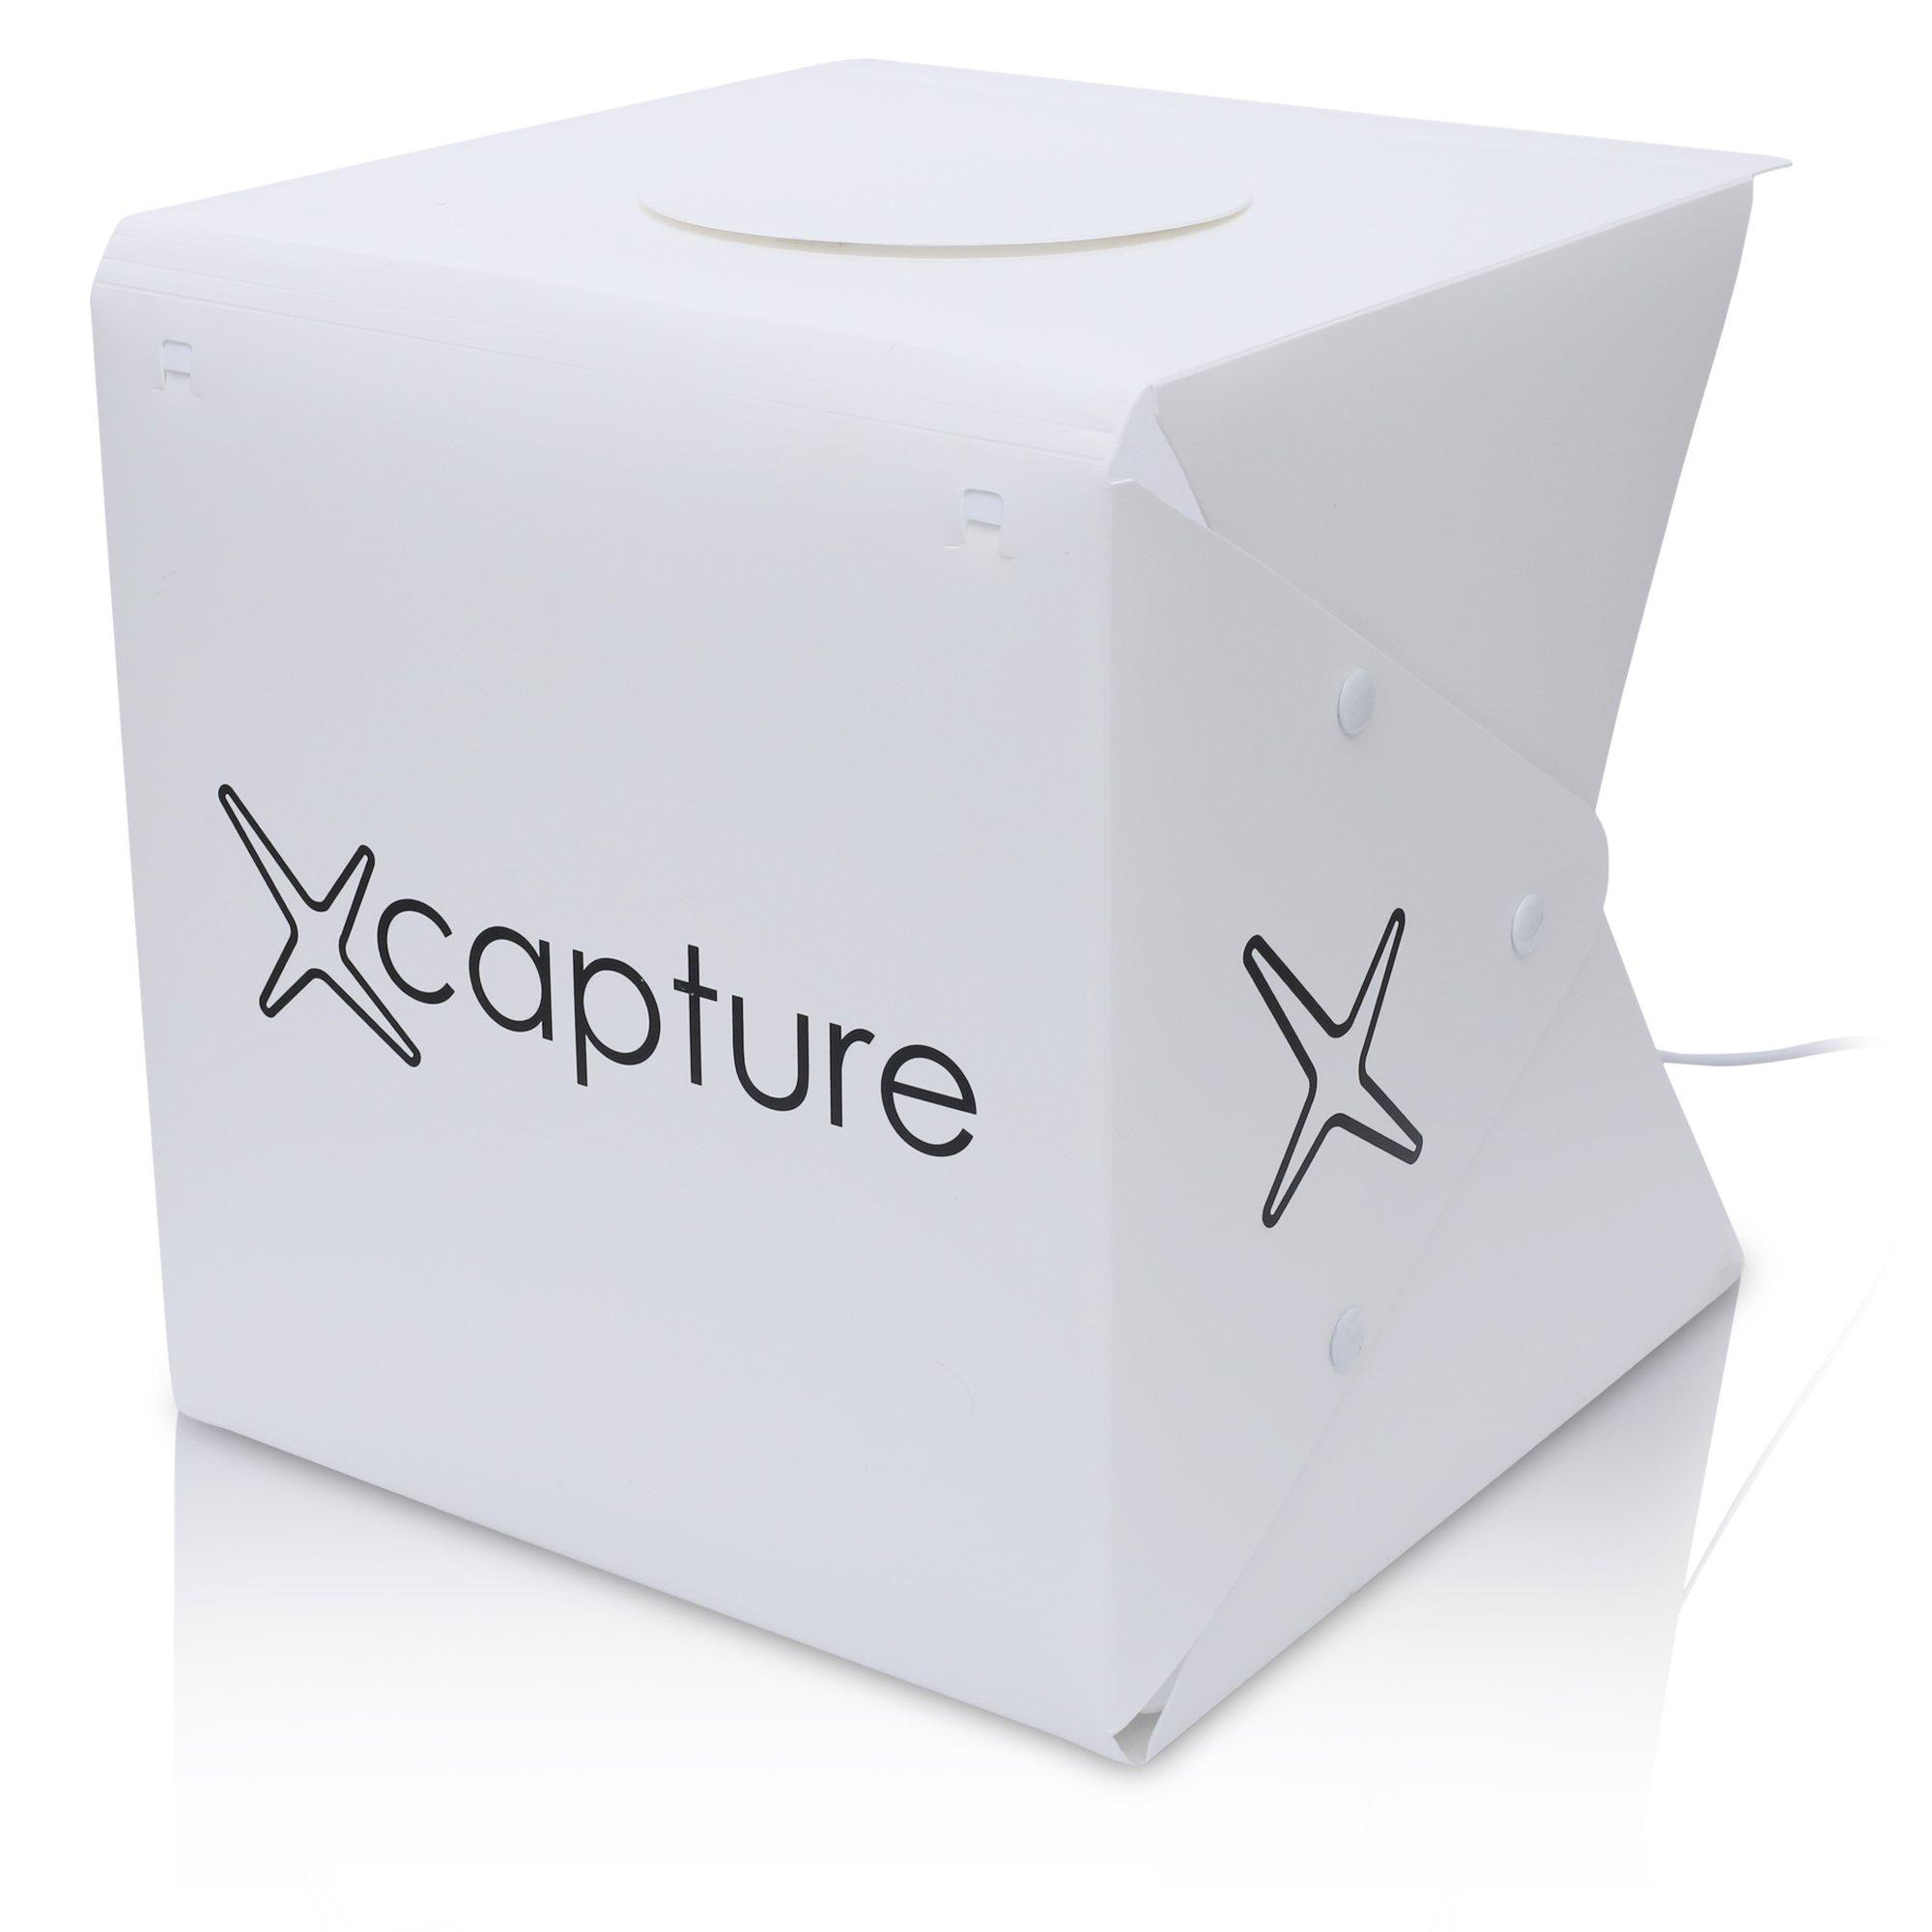 Capture Portable Photo Studio Box: LED Light Box Photo Tent- Large by Capture (Image #9)